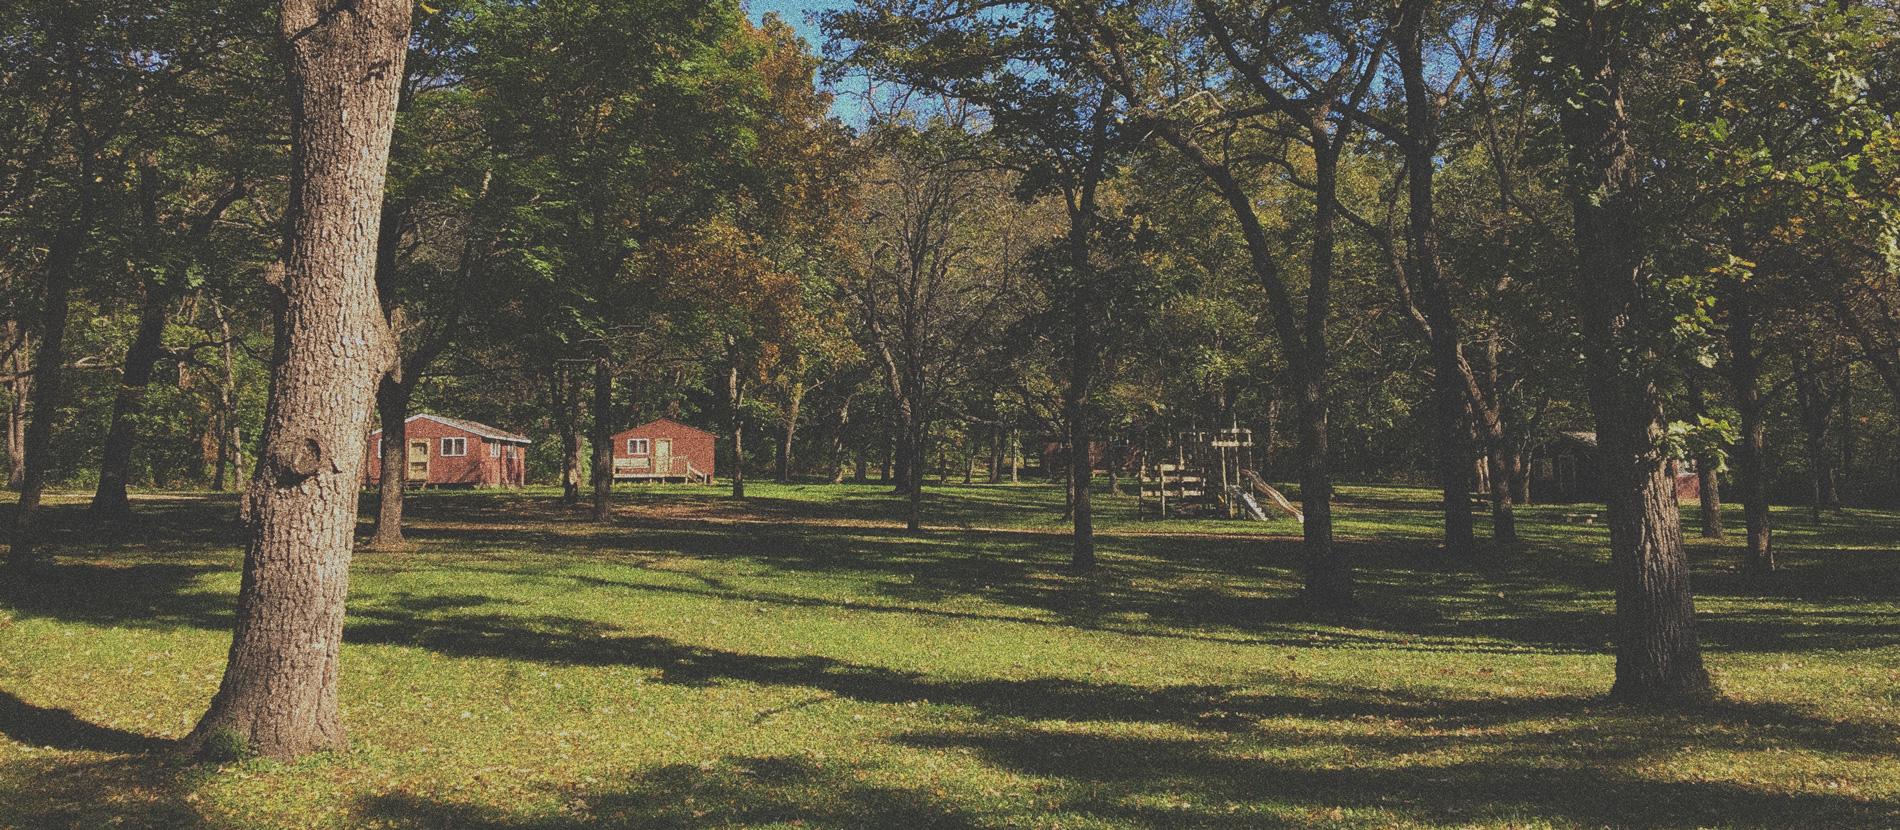 Rockford Christian Camp - Christian summer camp